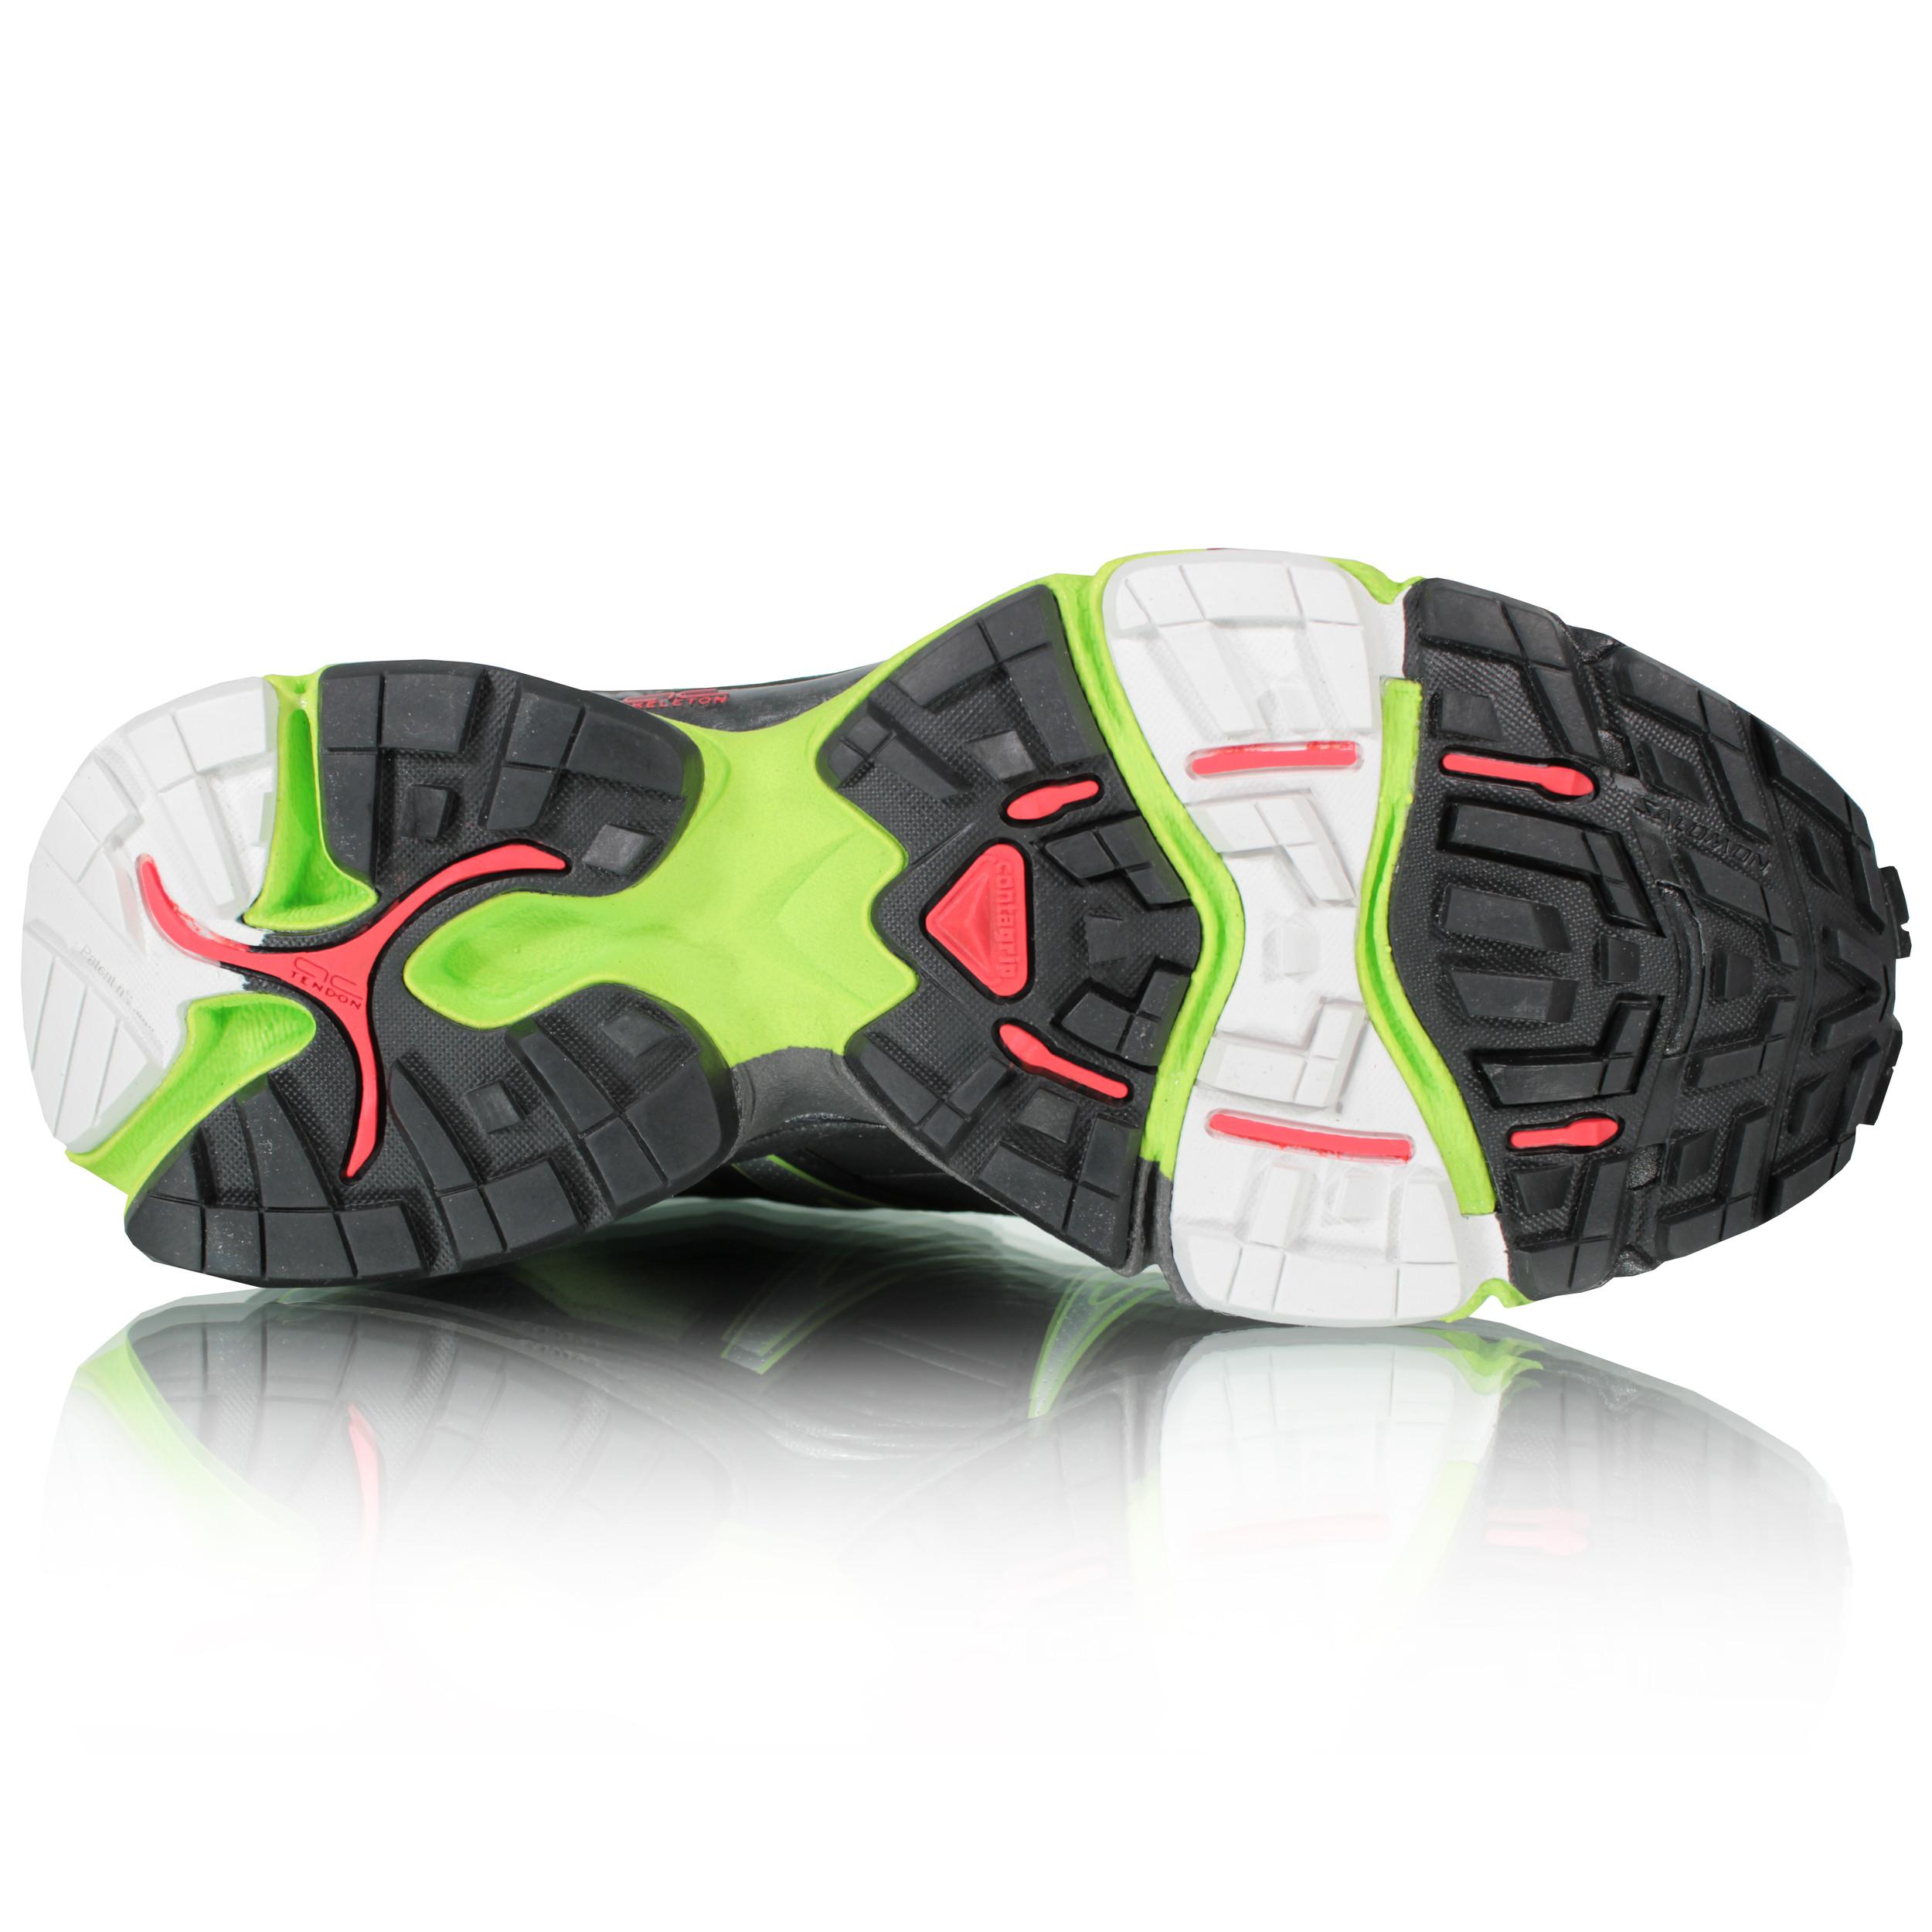 Salomon Shoes Womens Rei